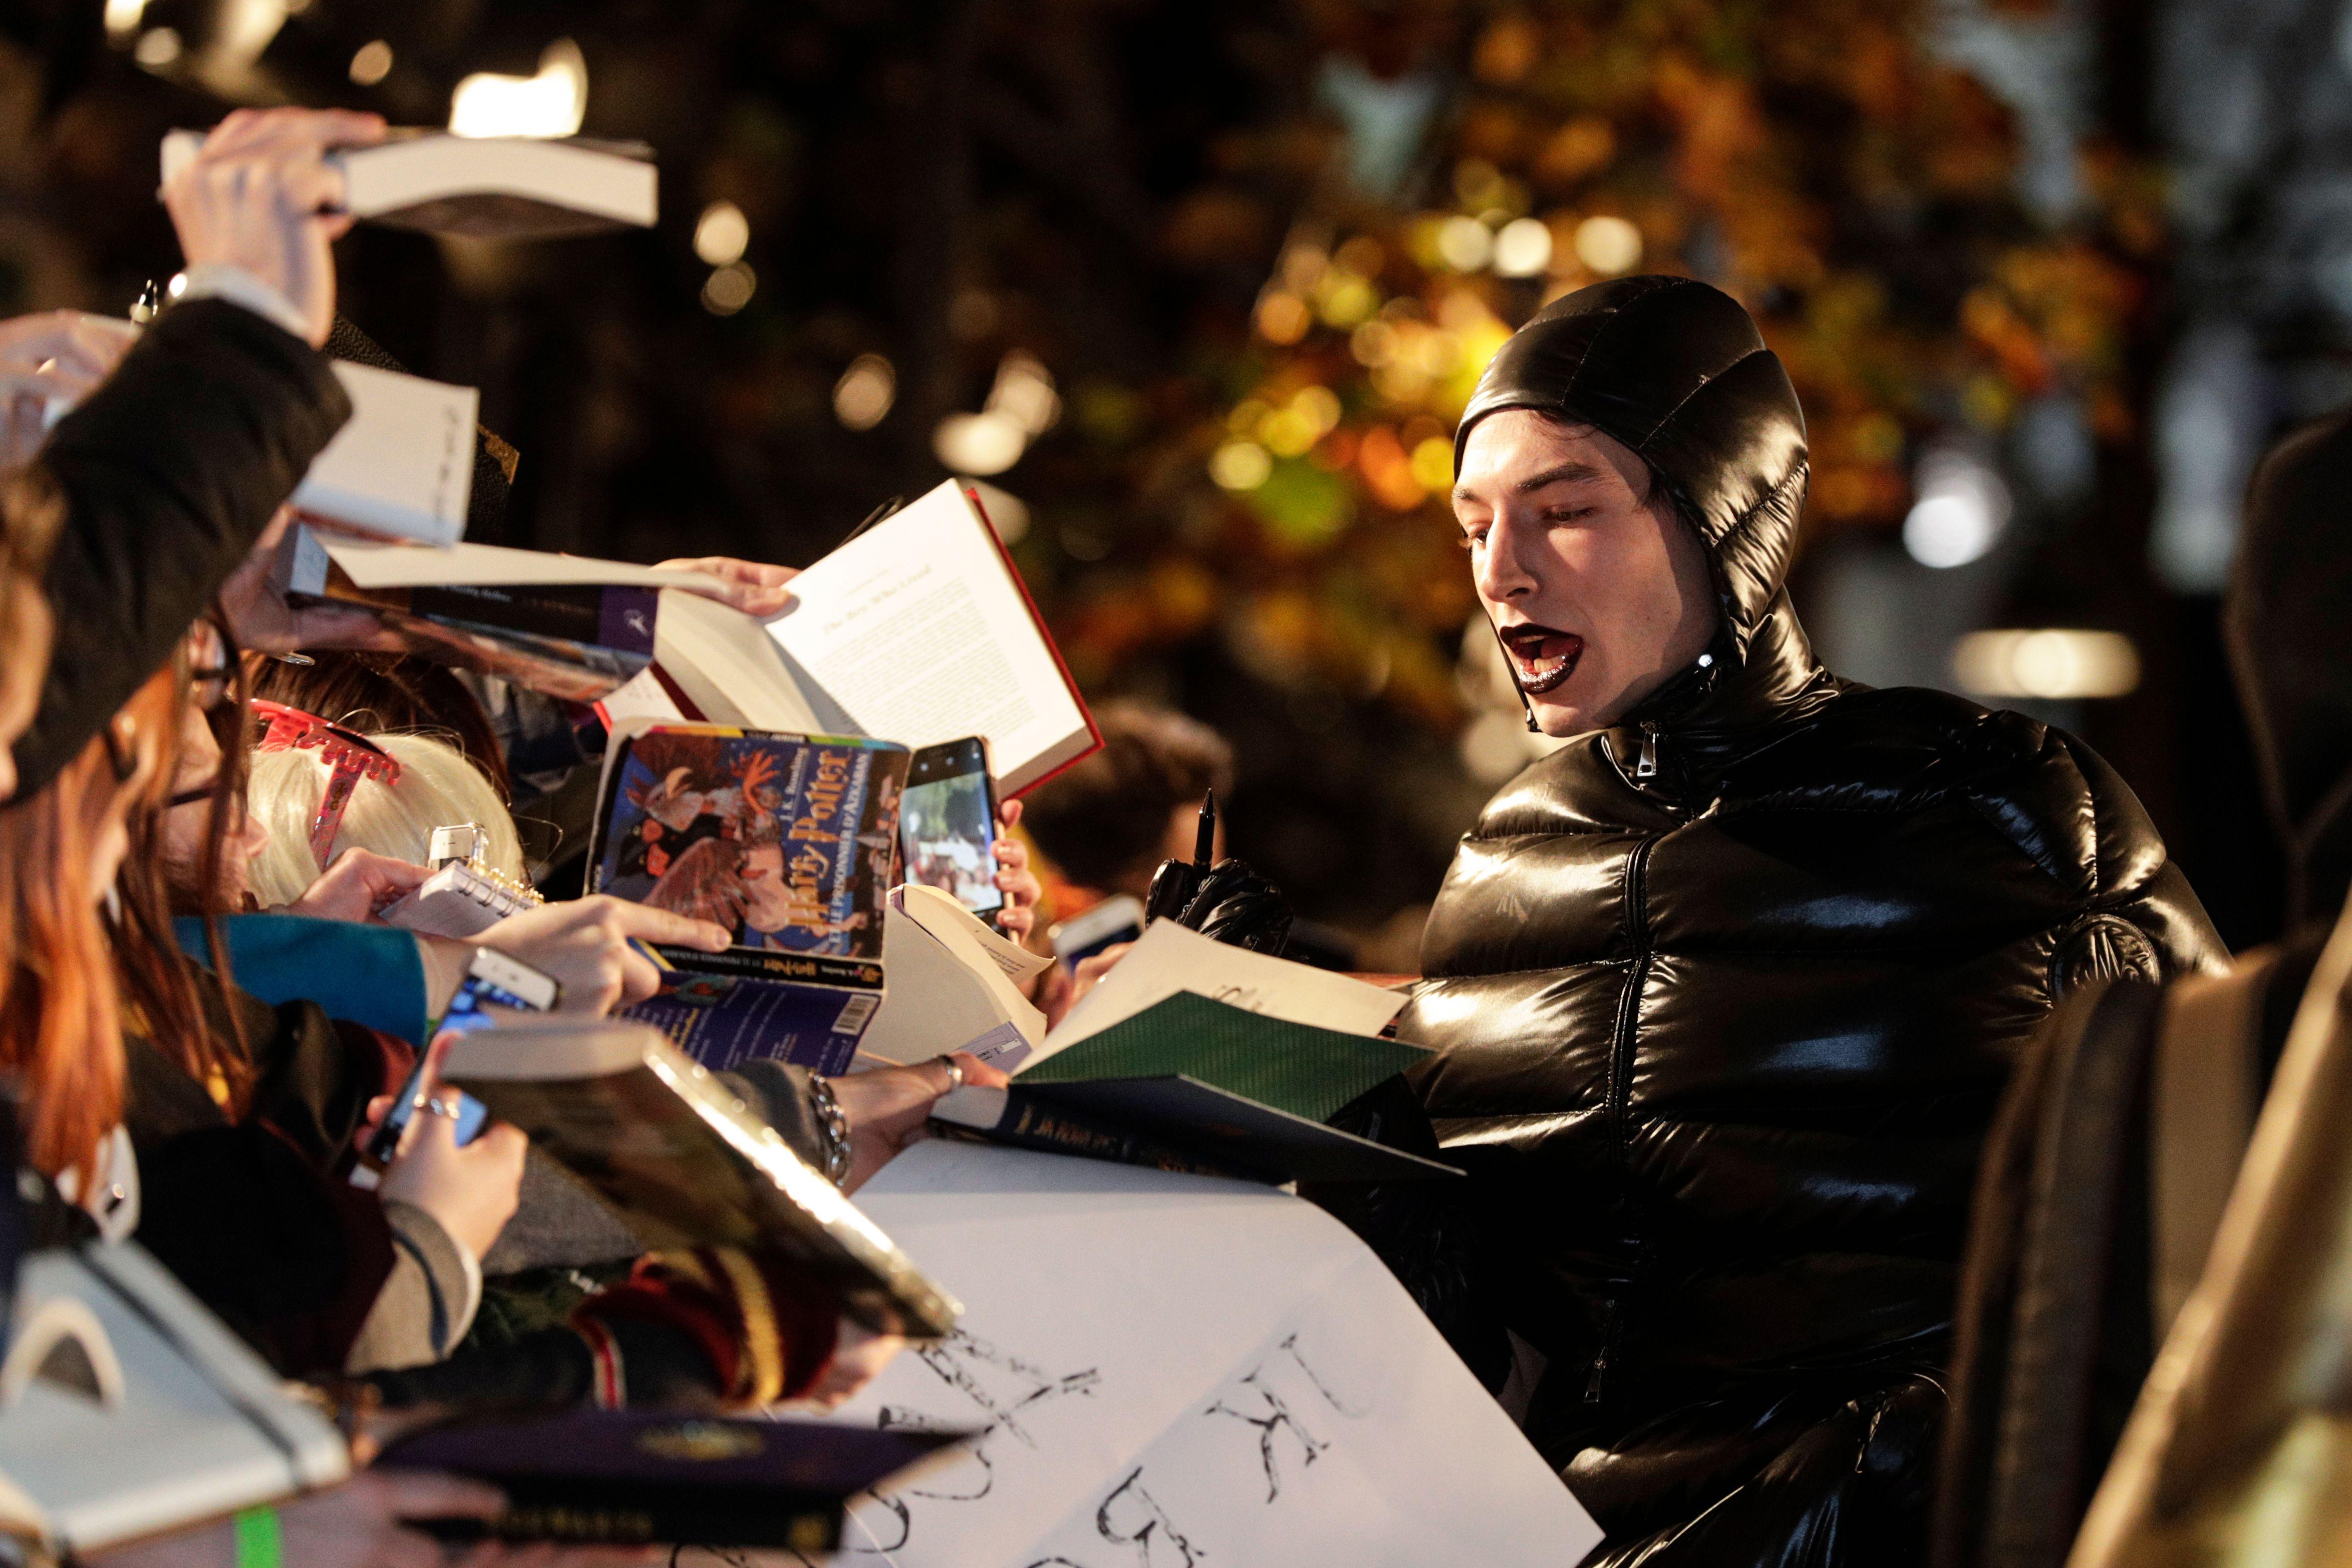 Animali Fantastici: I Crimini di Grindelwald - Ezra Miller firma autografi alla premiere parigina